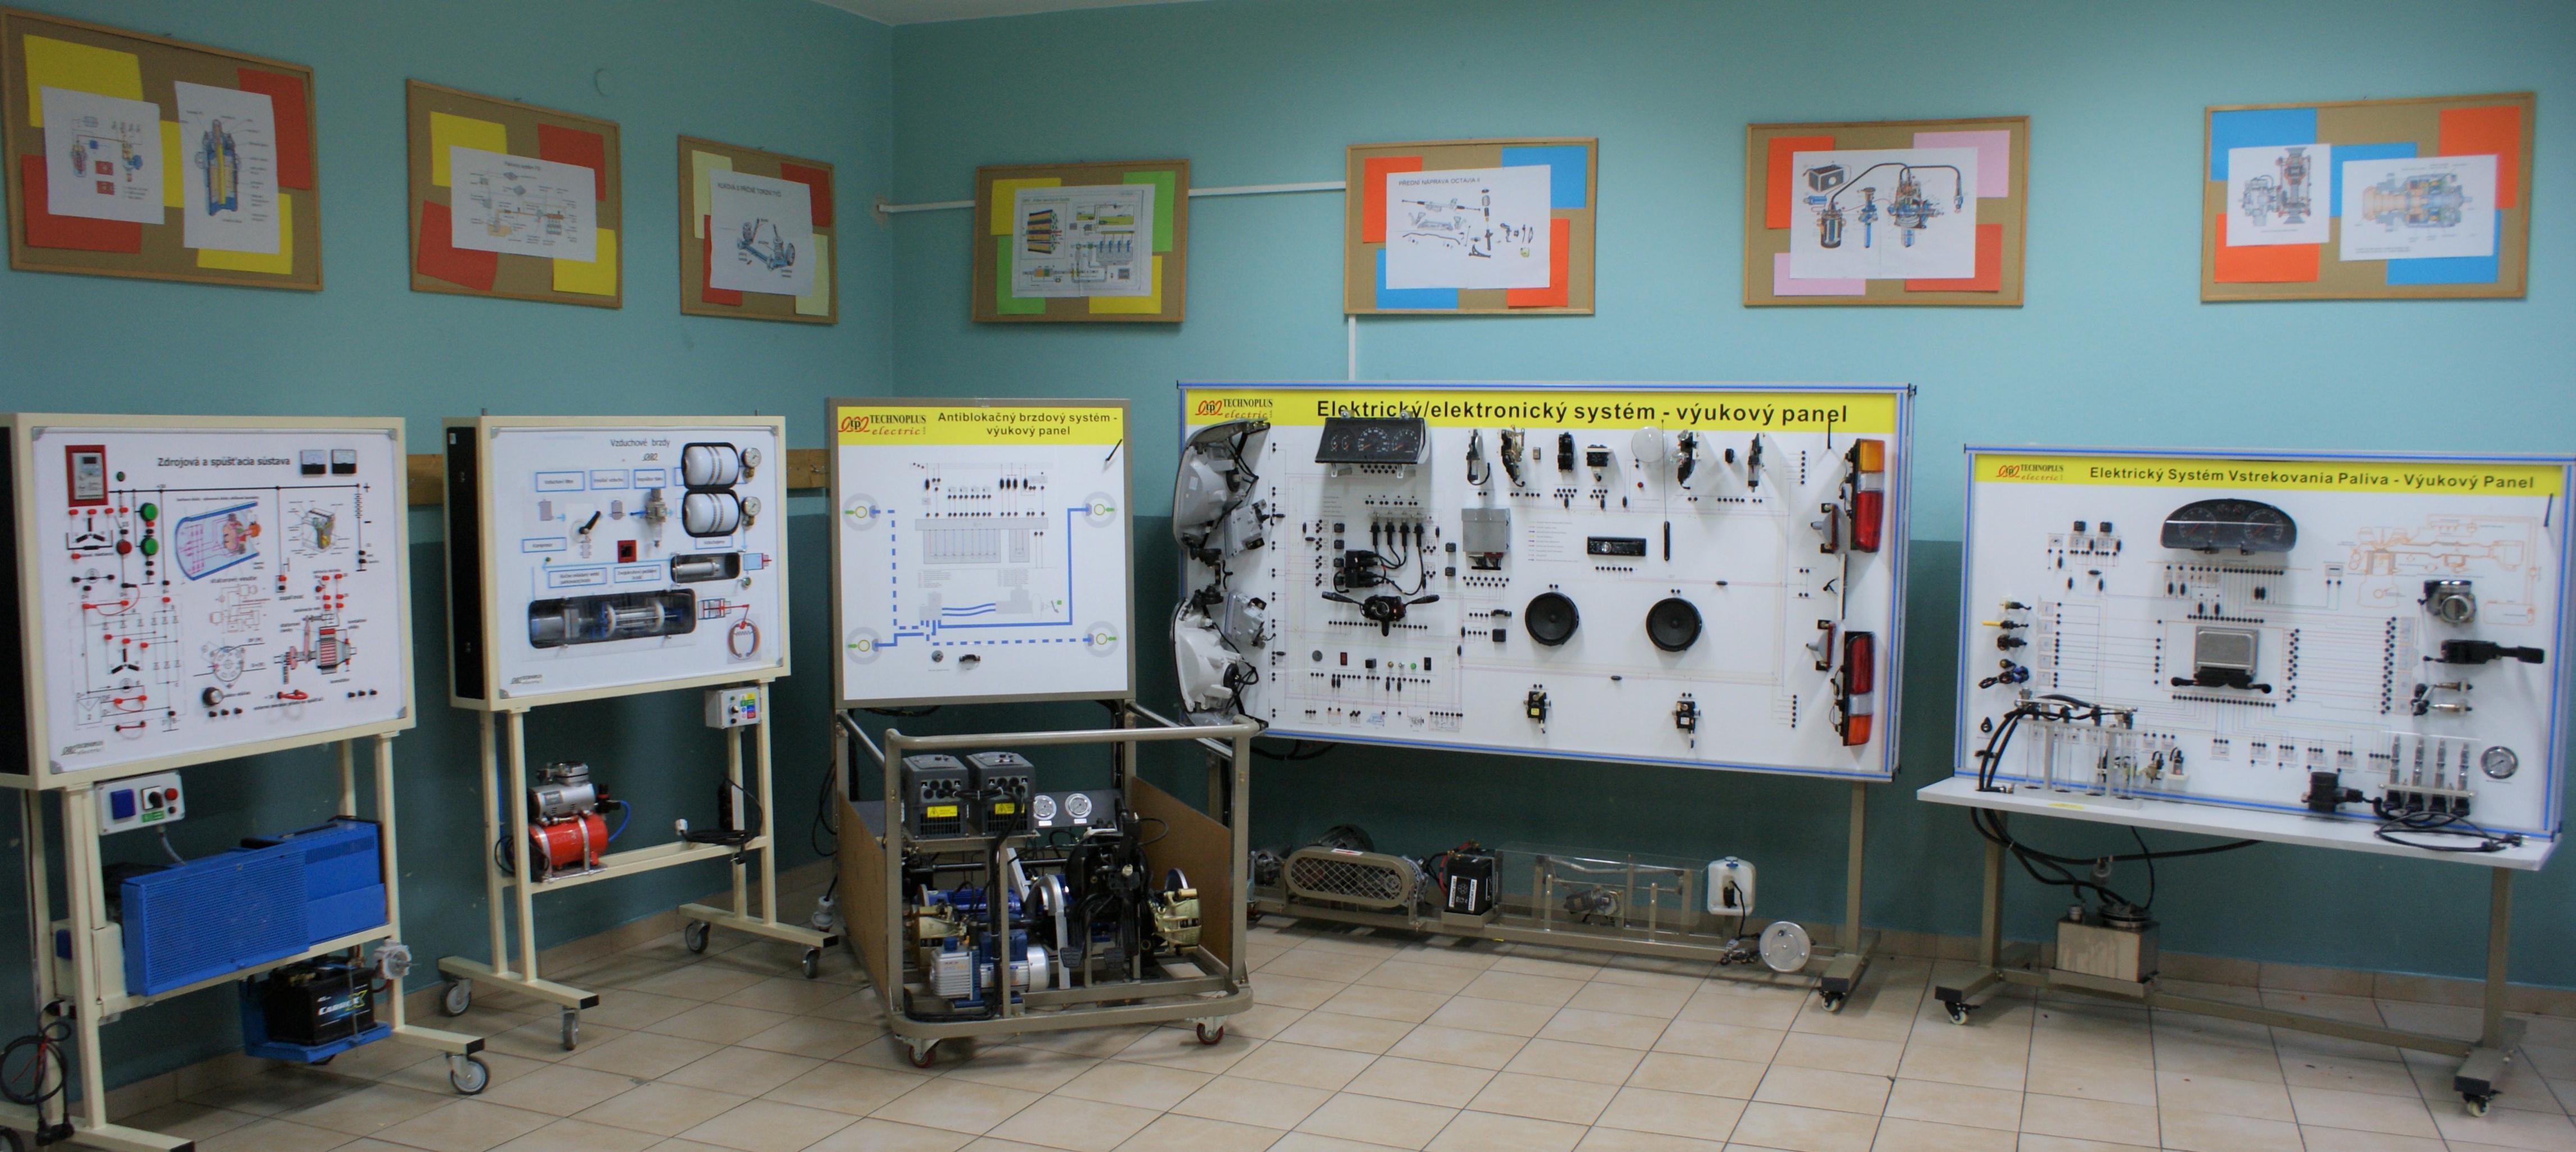 odbor automechanik stredna odborna skola topolcany